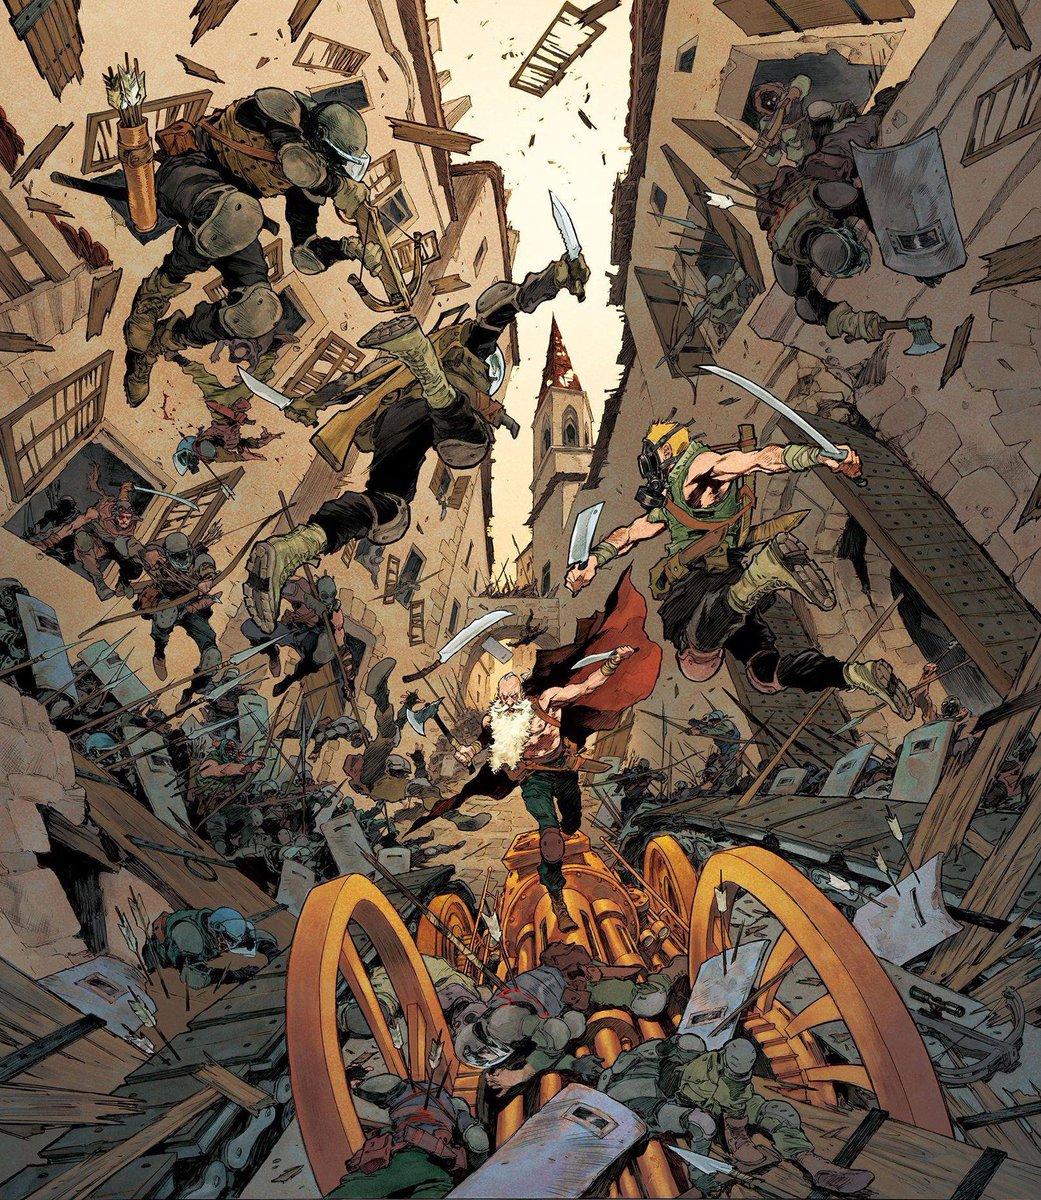 Cover of RAVAGE book 3 By Rey Macutay - @SuperaniArt-ist Colors: Walter / Novel: Barjavel / Script: @JDMorvan / Publisher: @GlenatBD https://t.co/f01ybmaGTL